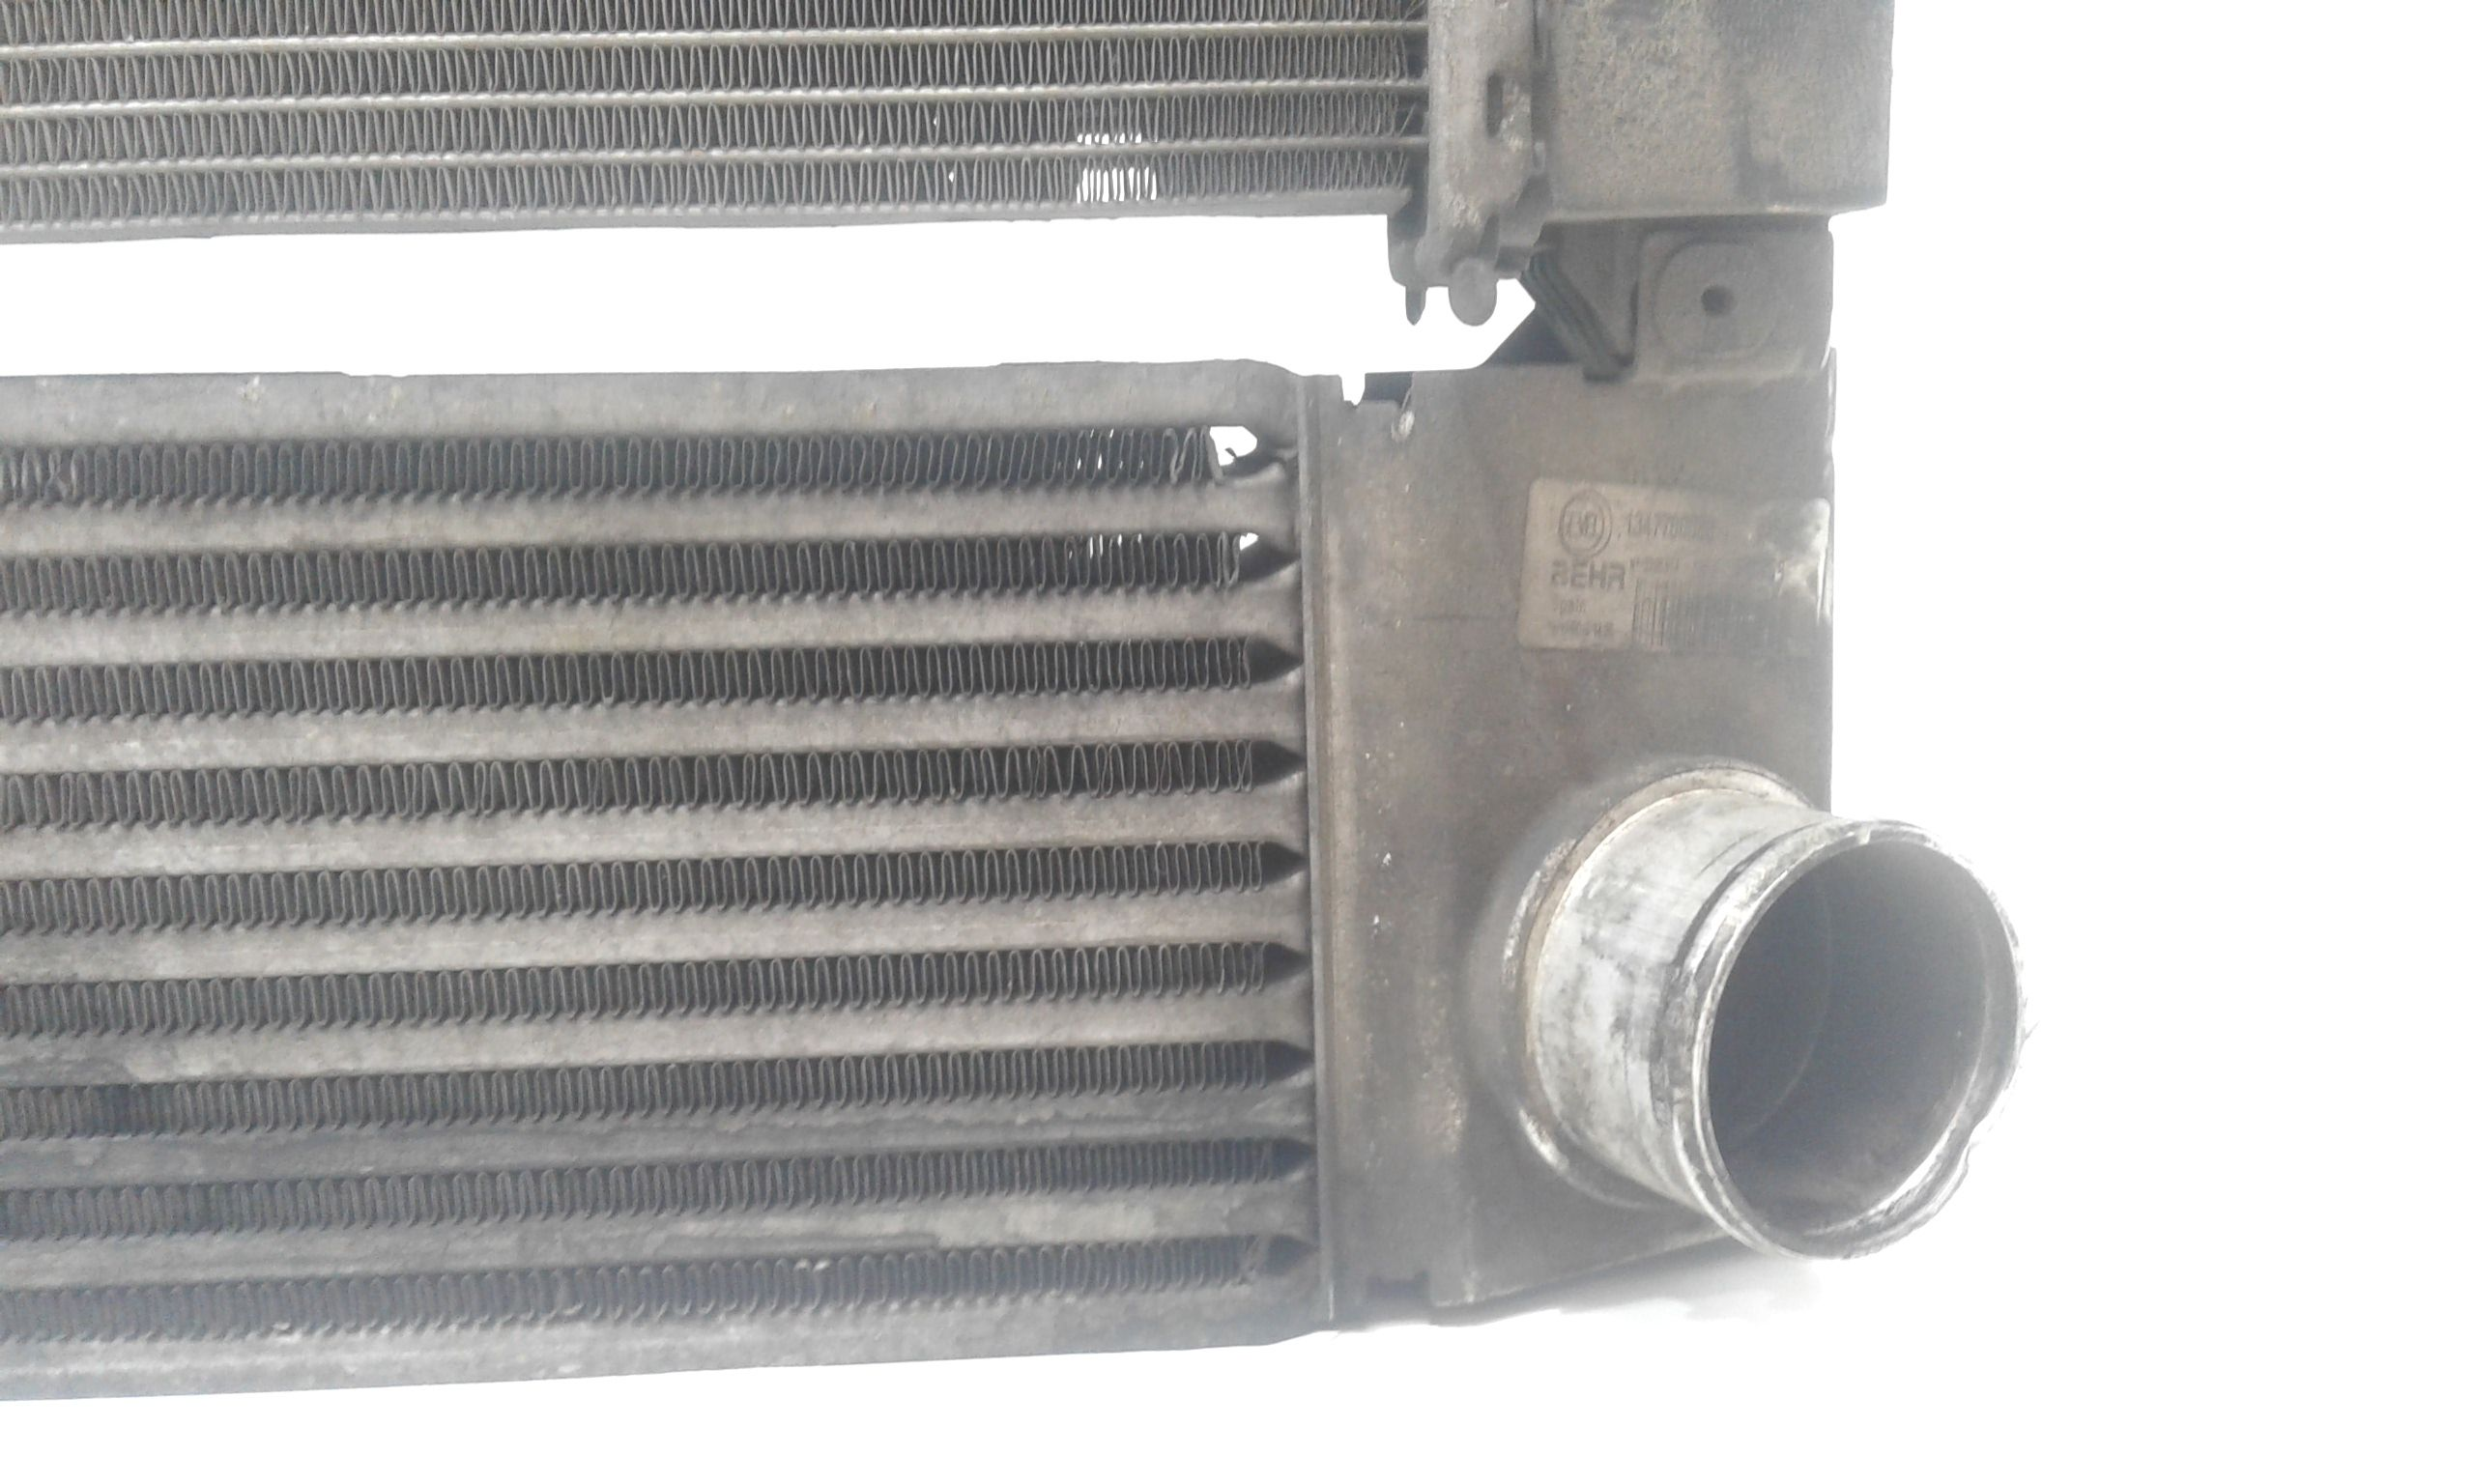 KIT RADIATORI PEUGEOT Boxer 3° Serie 2200 Diesel    (2010) RICAMBI USATI